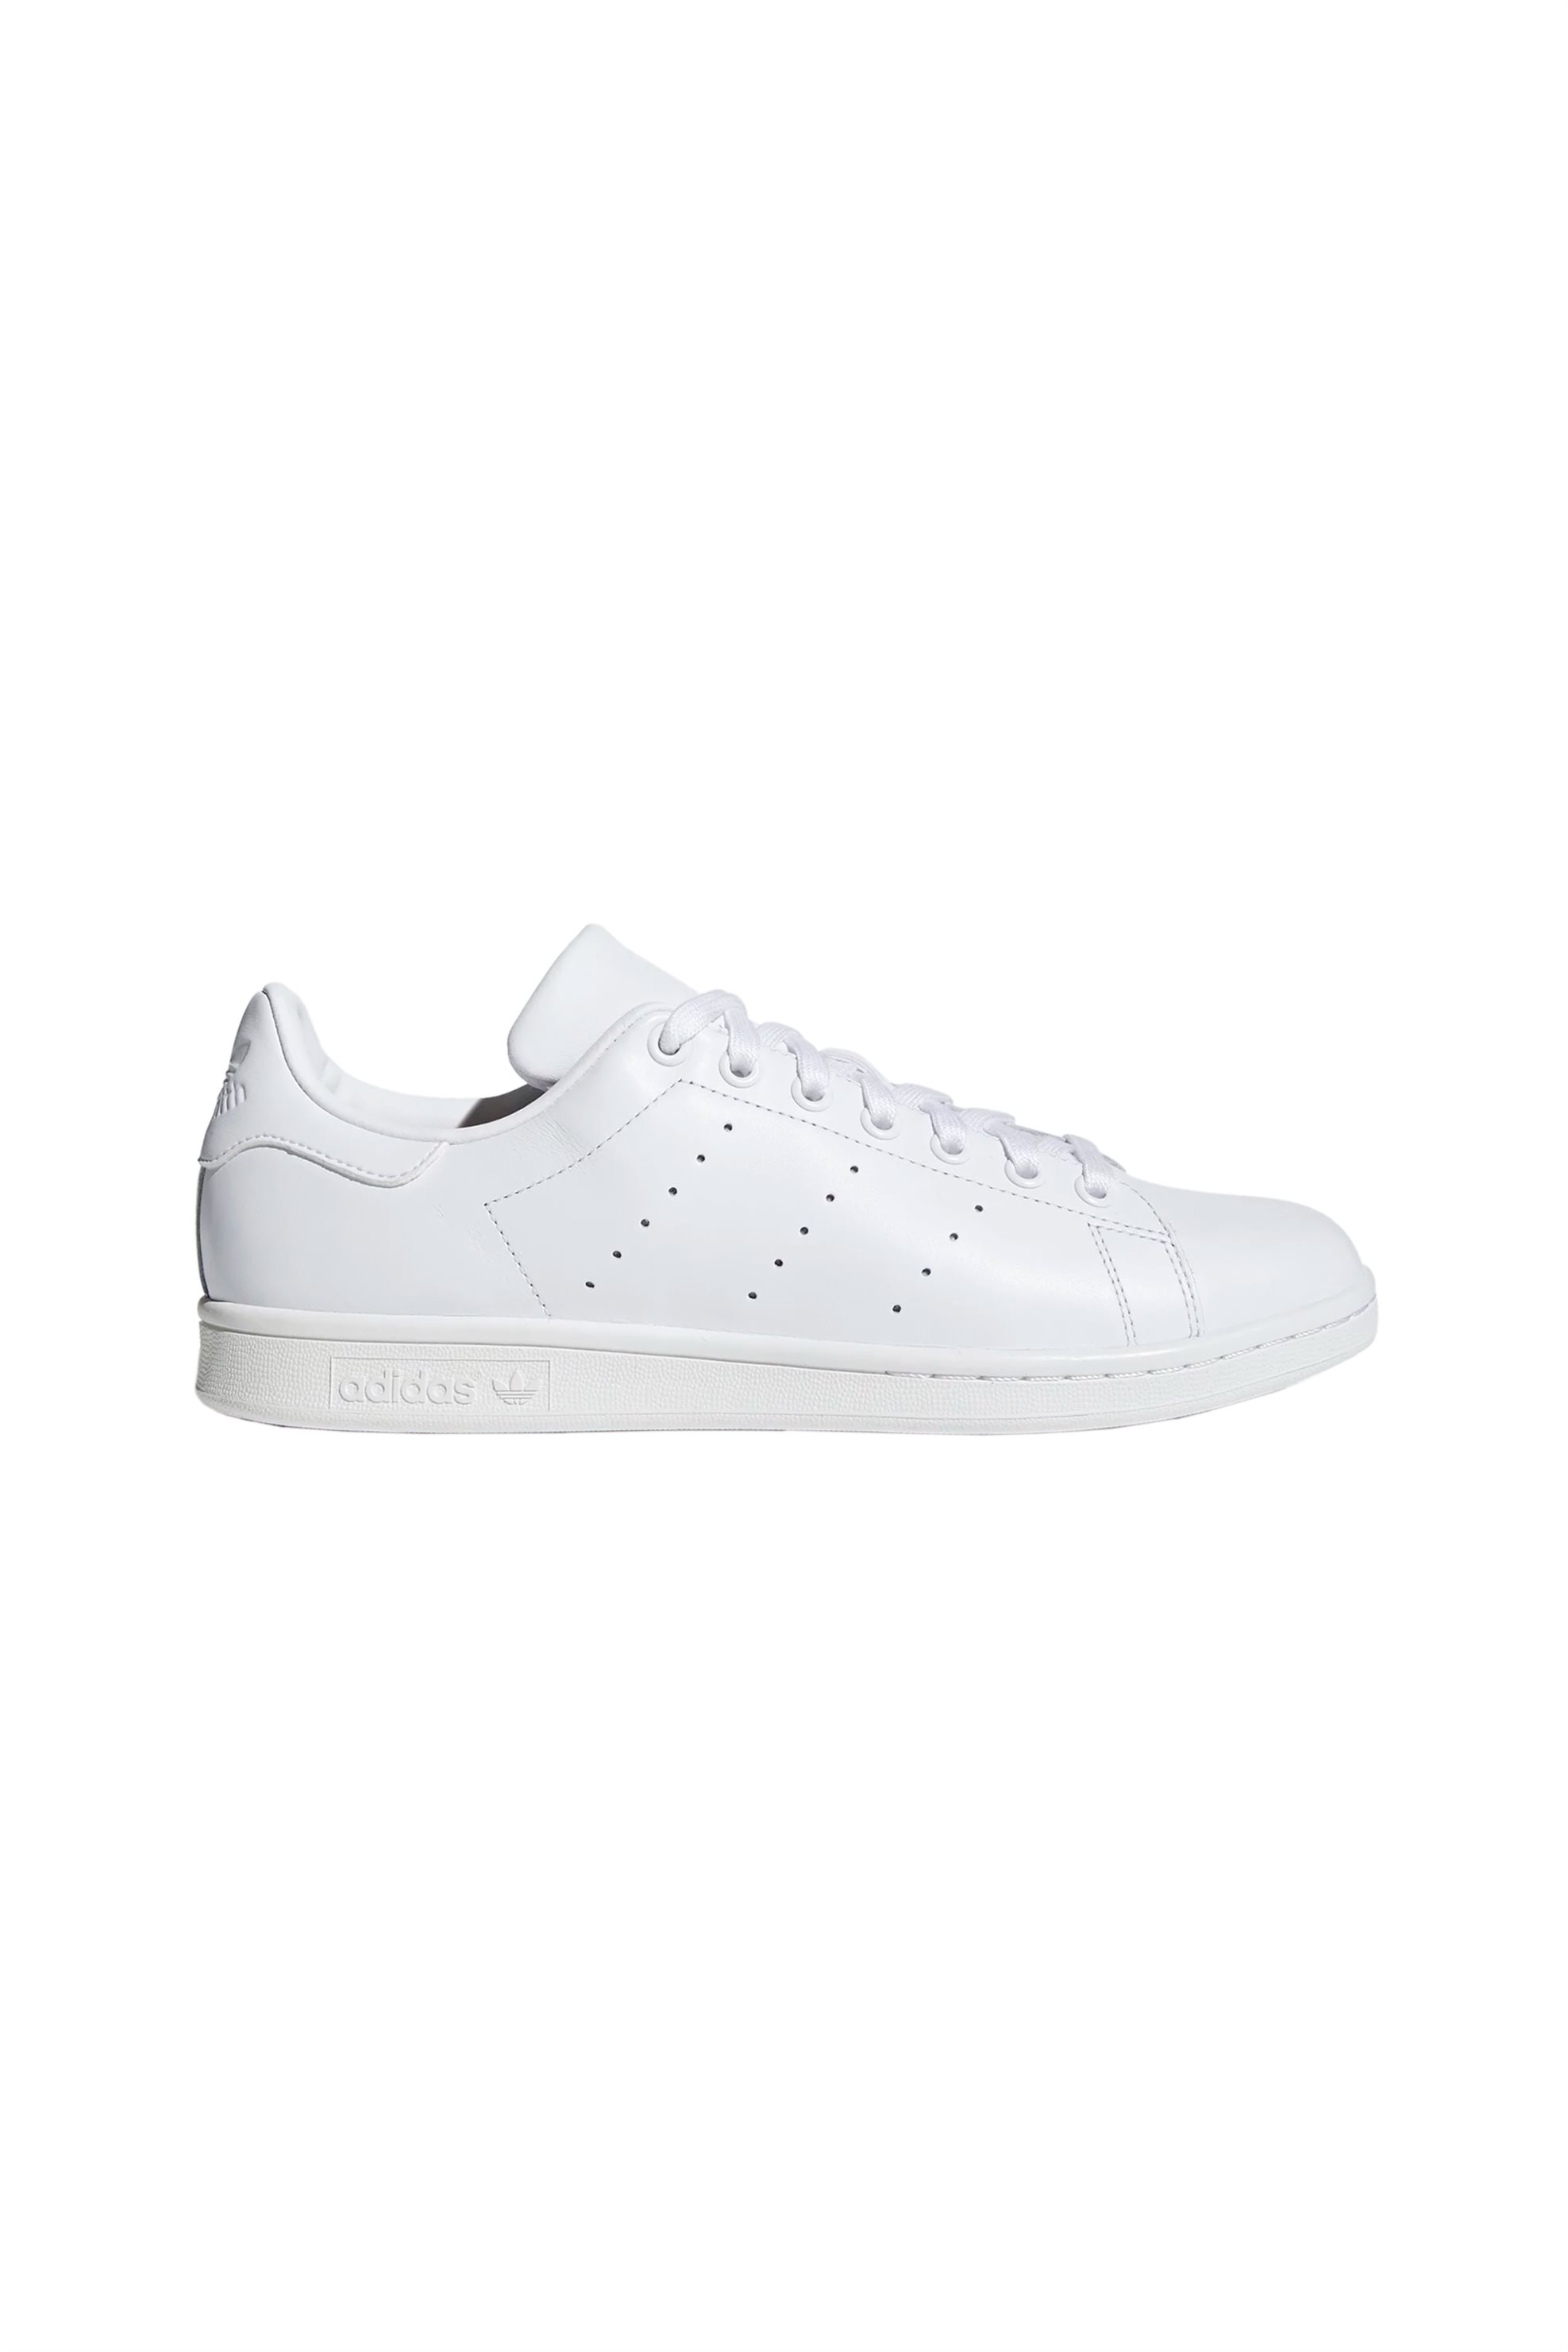 5a5679ccc02 Notos Adidas ανδρικά αθλητικά παπούτσια Stan Smith – S75104 – Λευκό